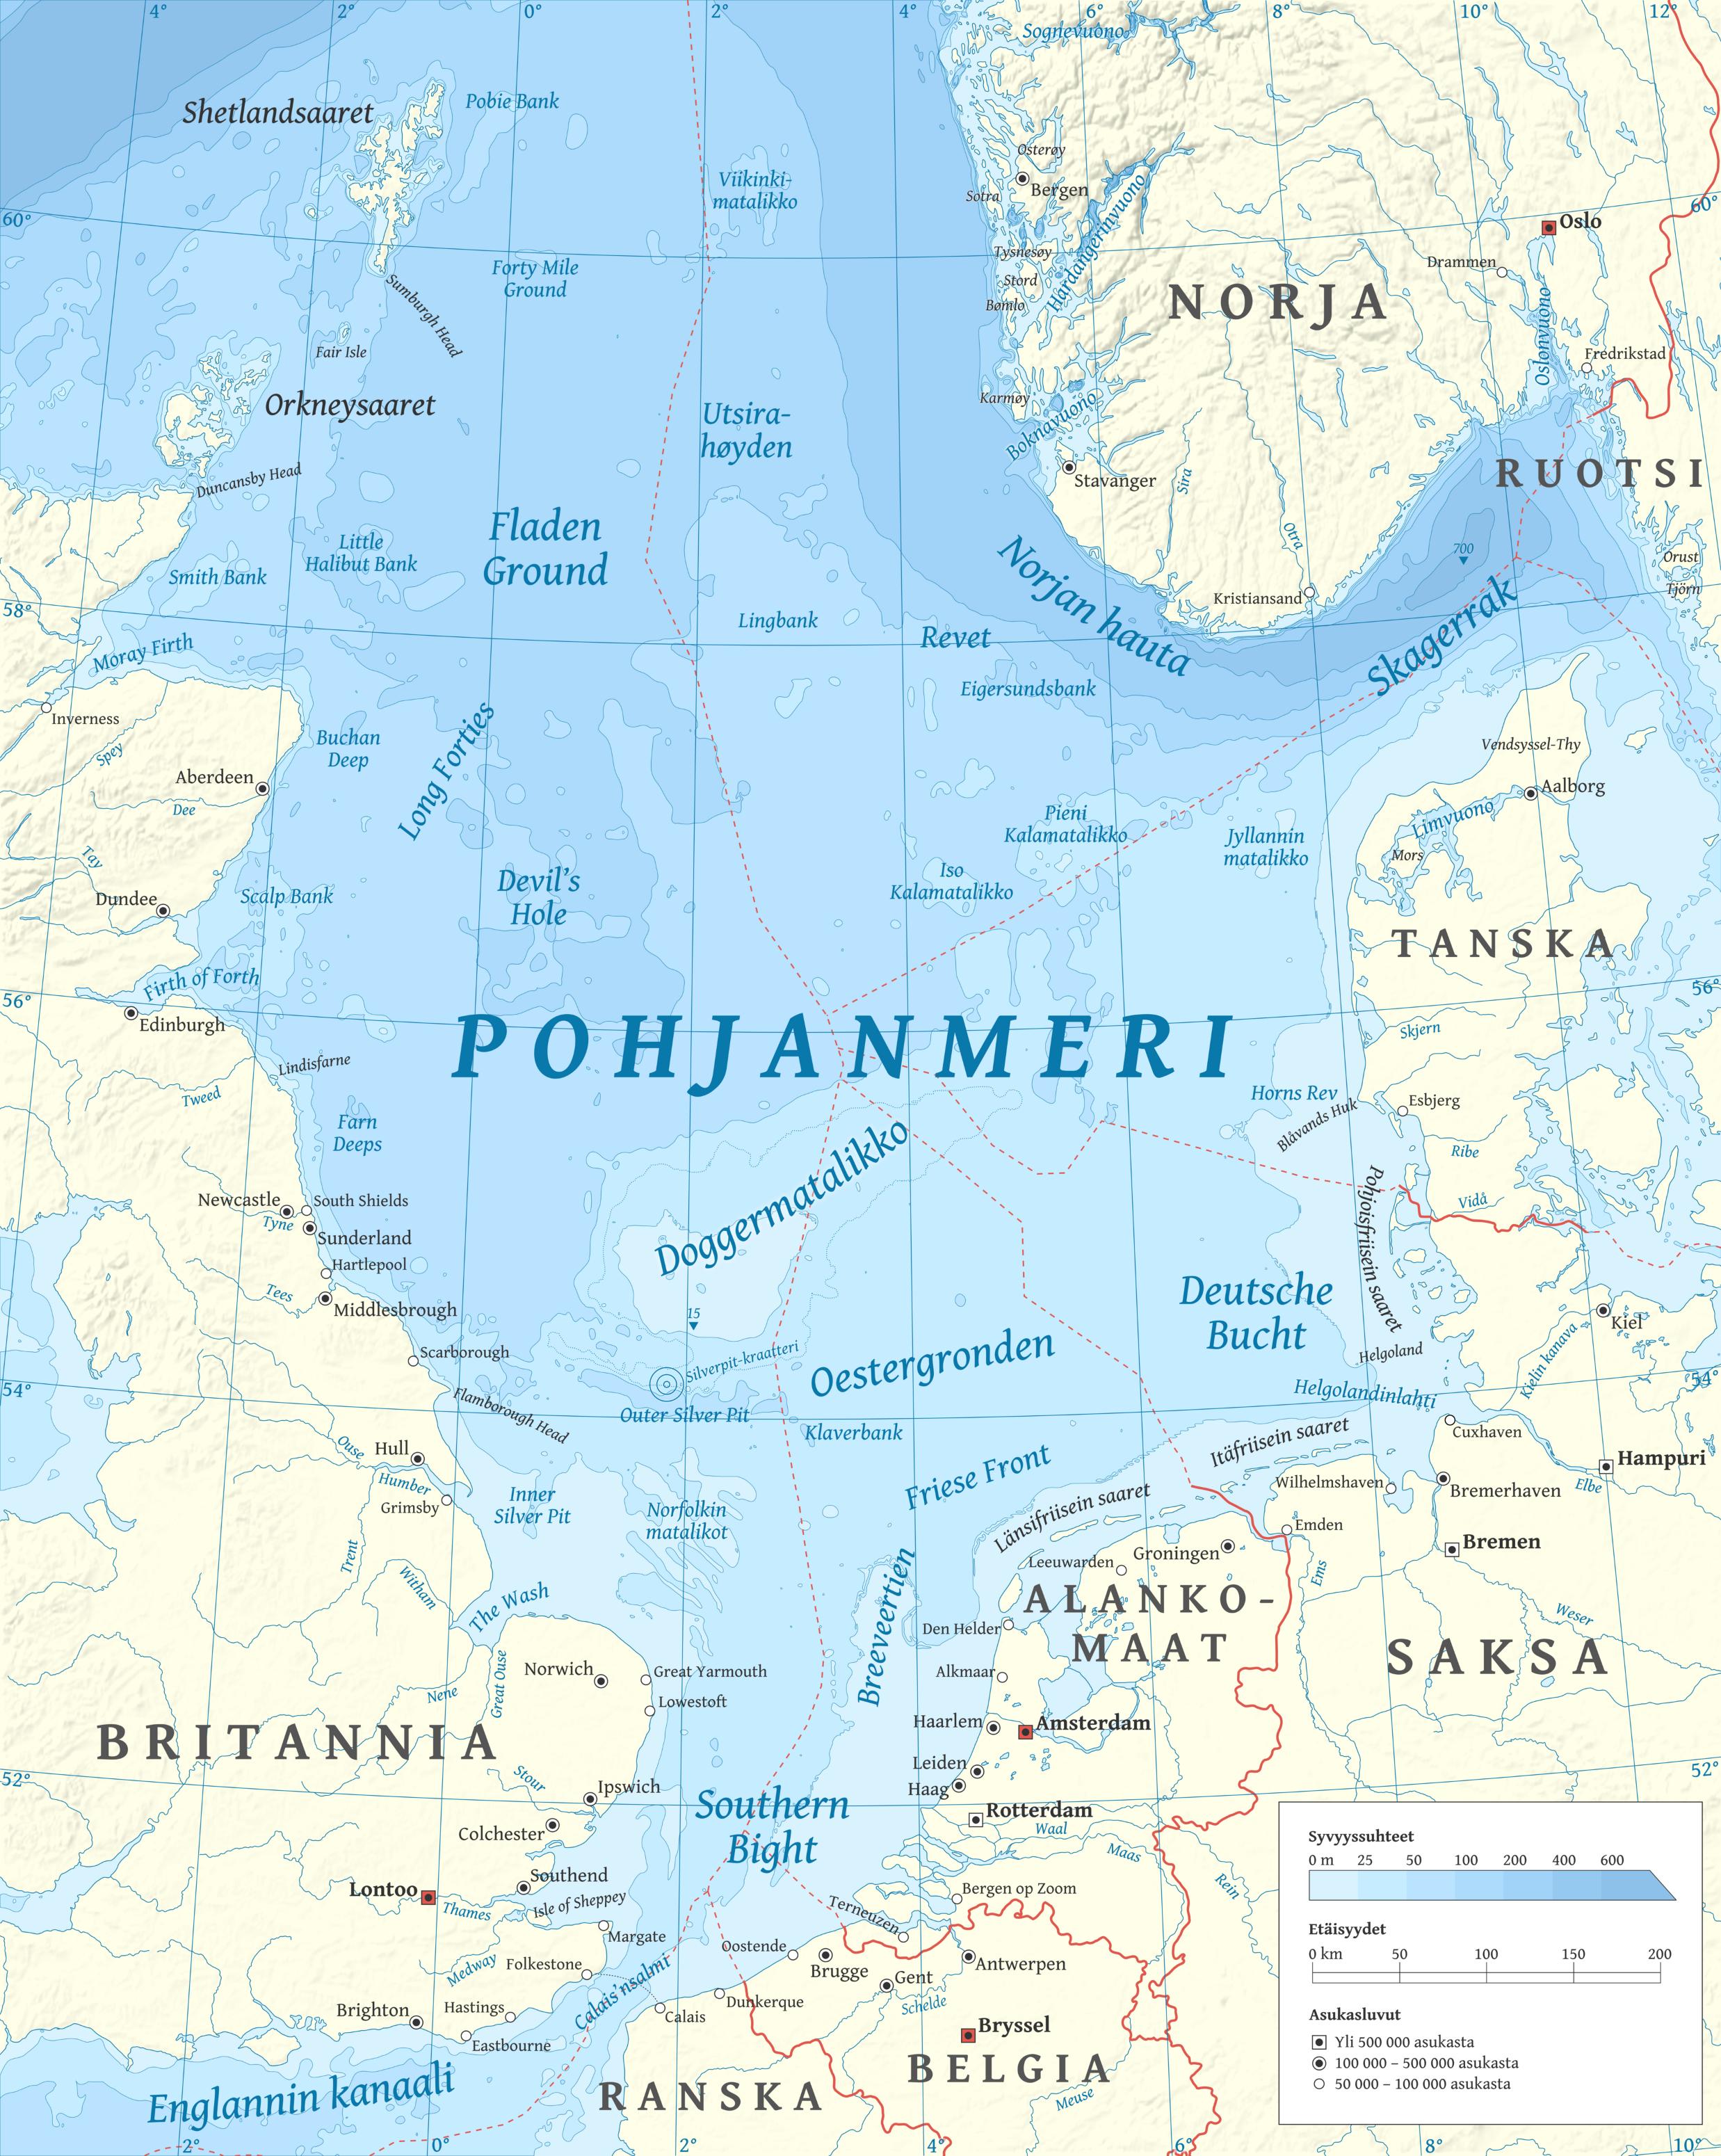 Pohjanmeri Wikiwand